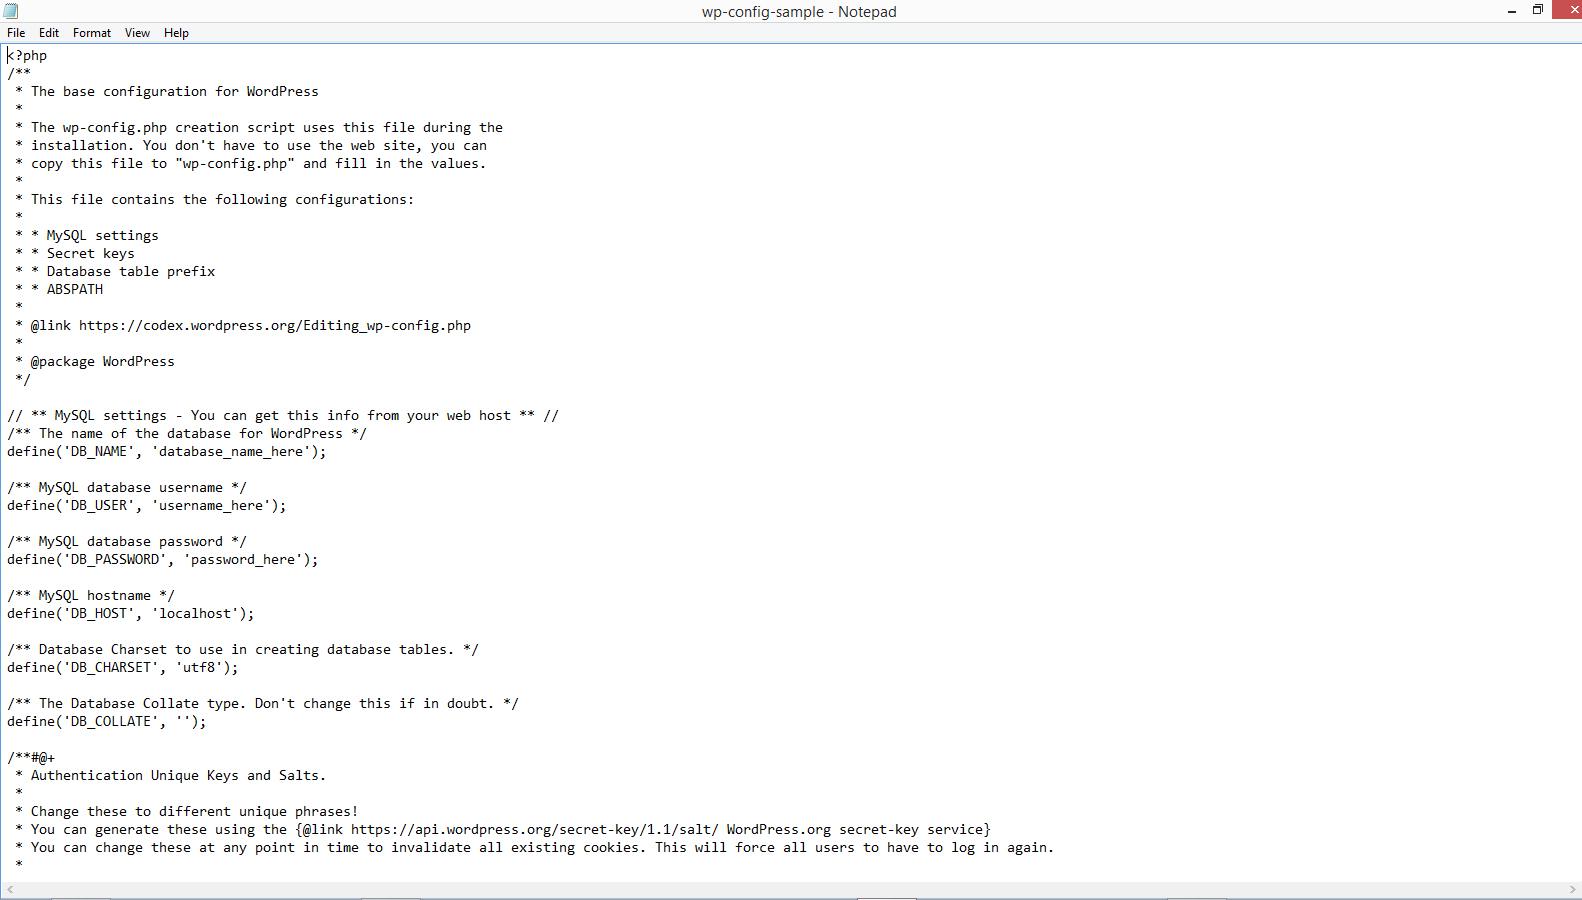 Otvaranje datoteke wp-config-sample.php u programu Notepad